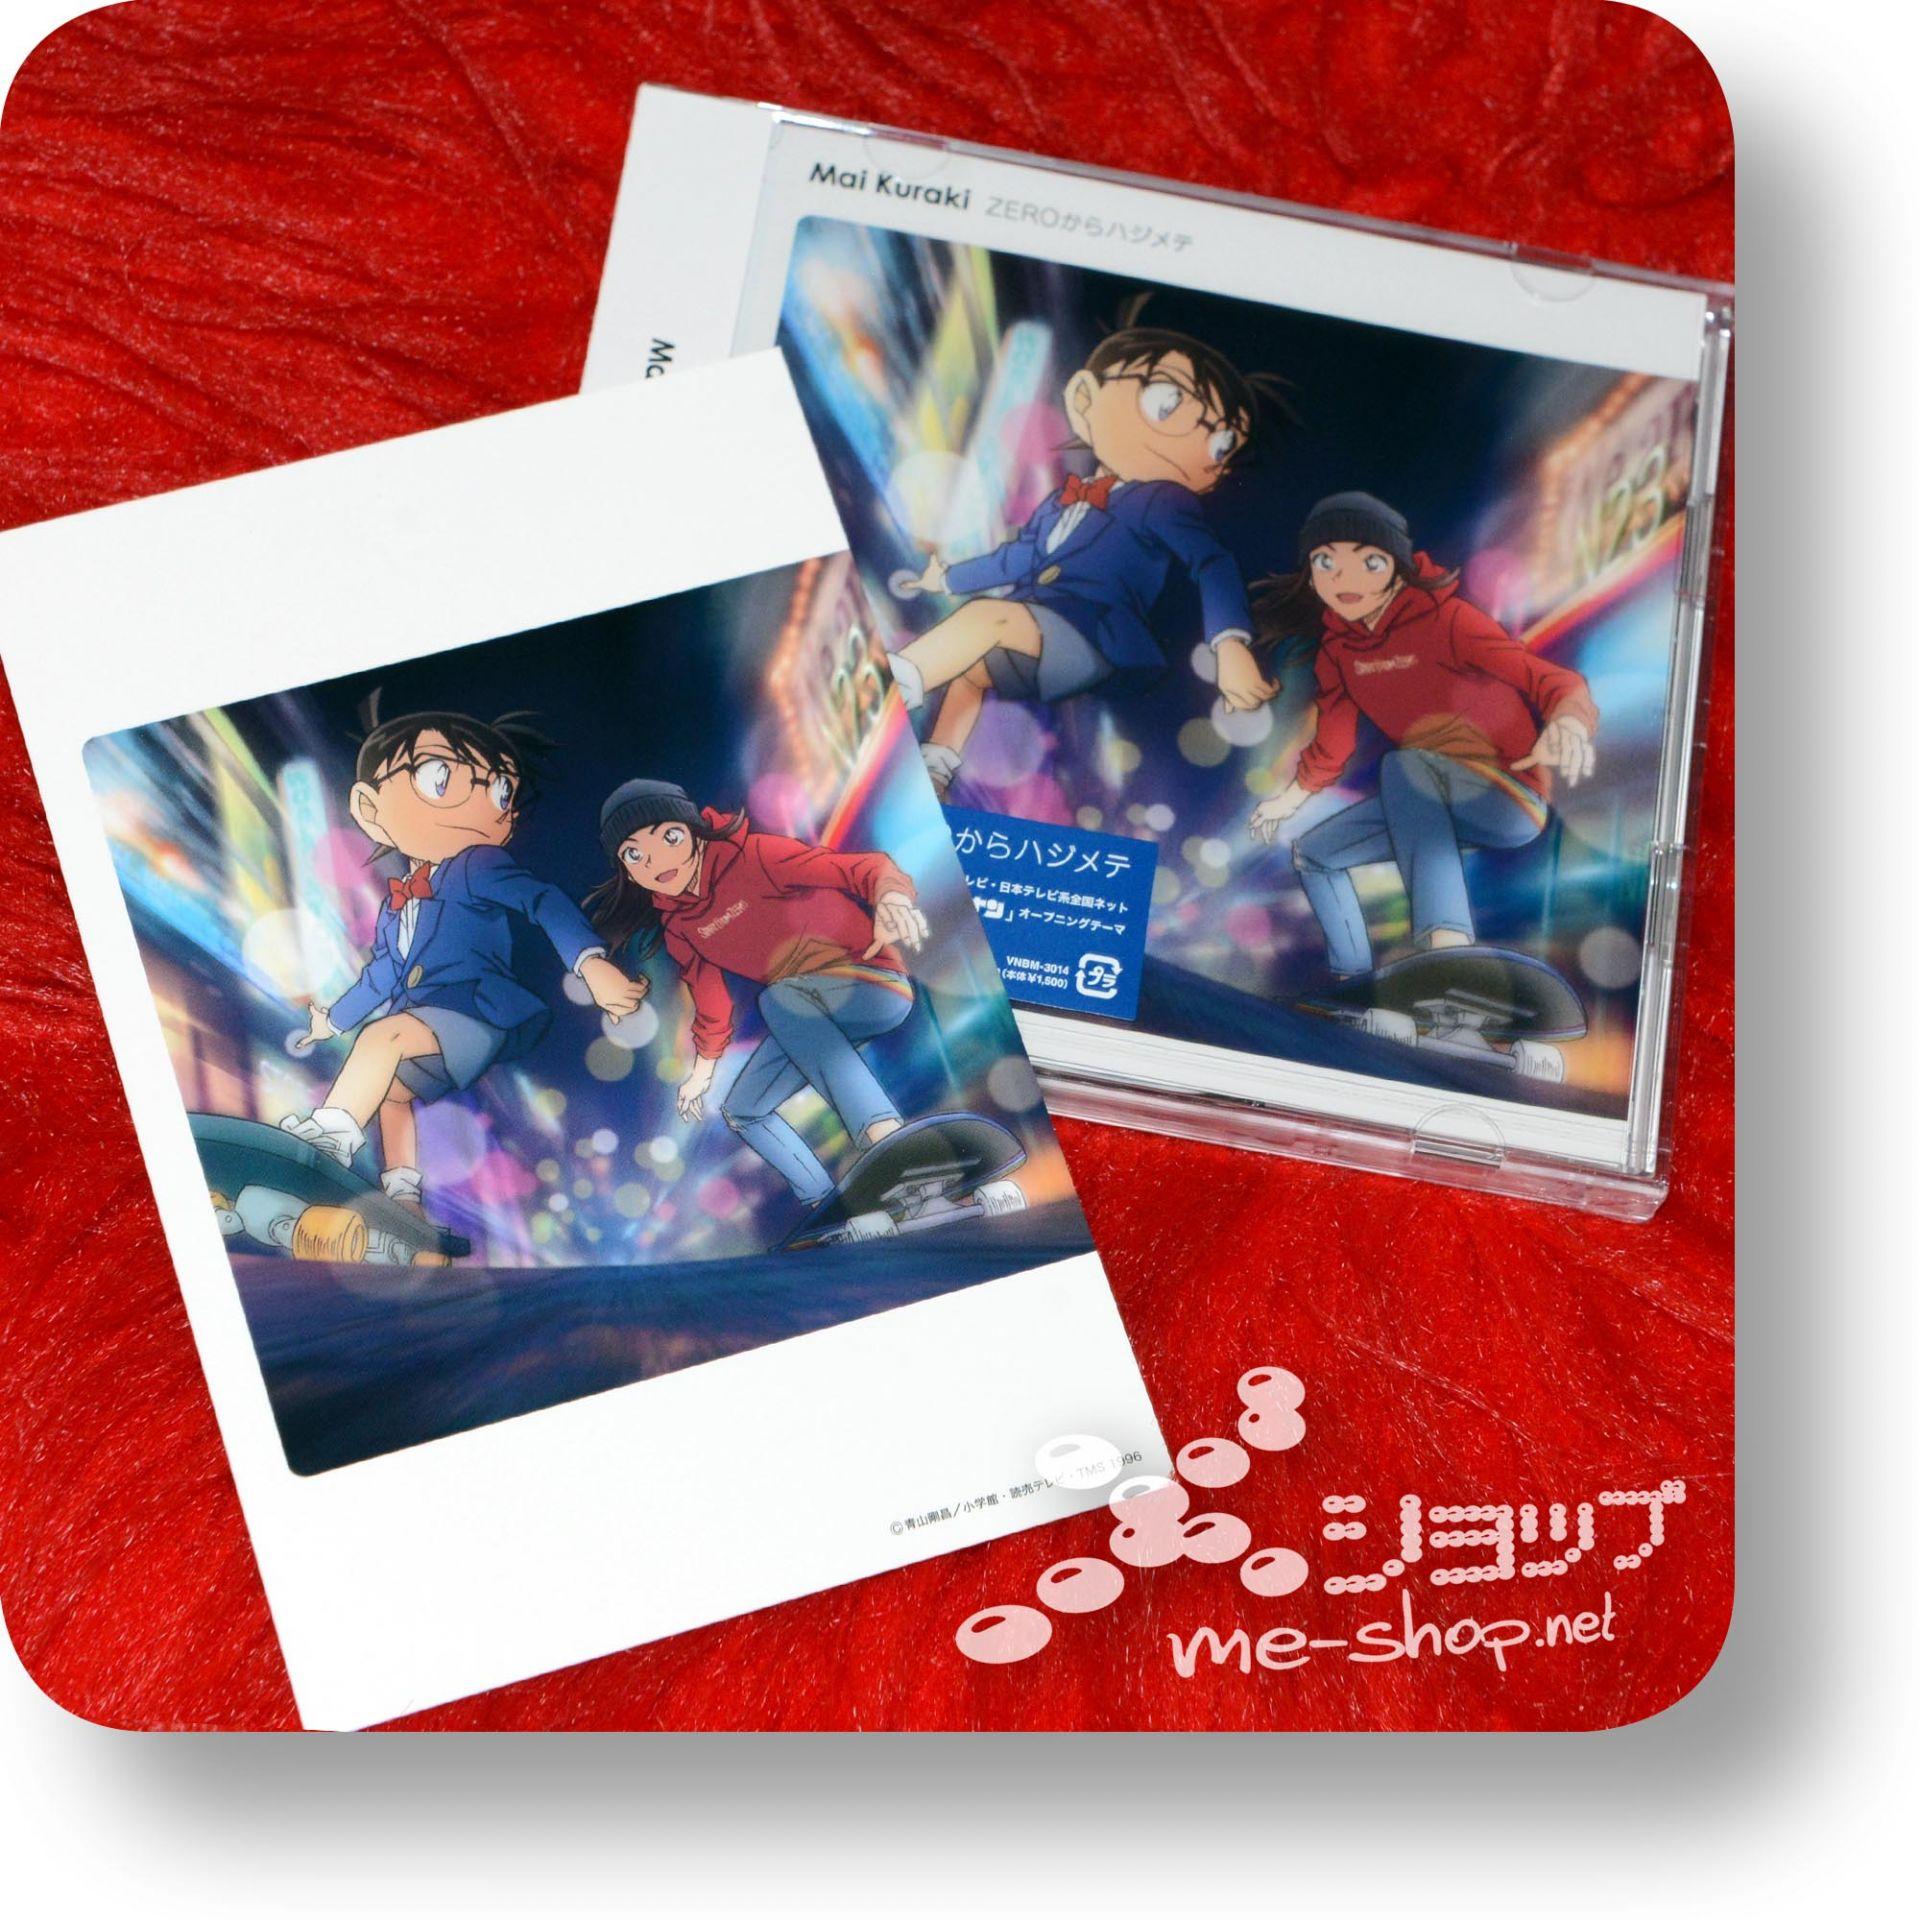 mai kuraki zero kara dvd+cd anime+bonus